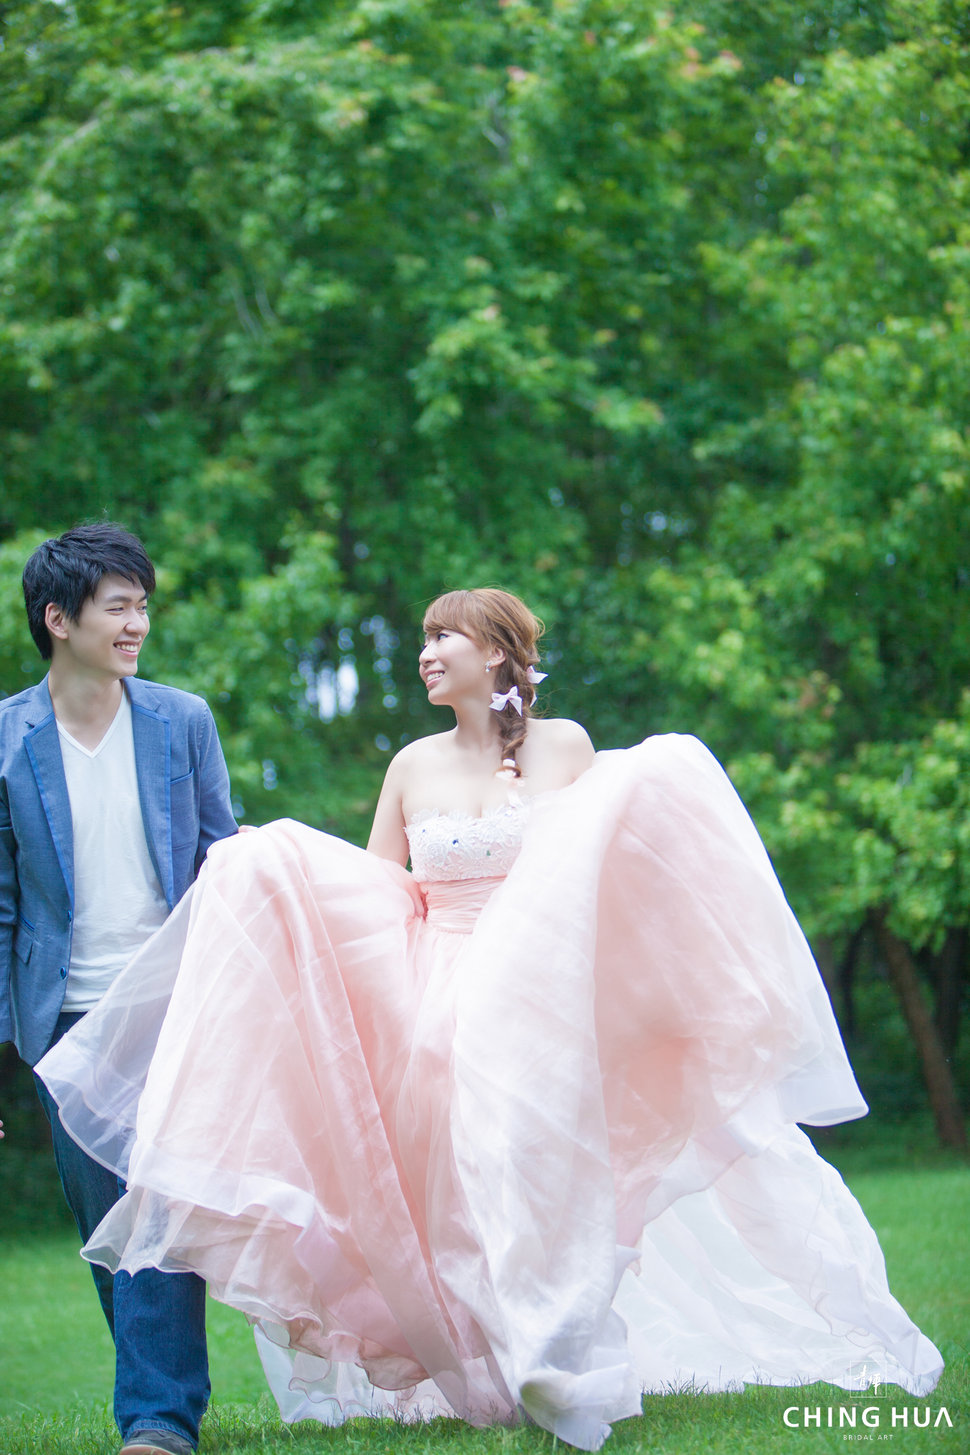 (編號:433135) - 青樺婚紗CHINGHUA - 結婚吧